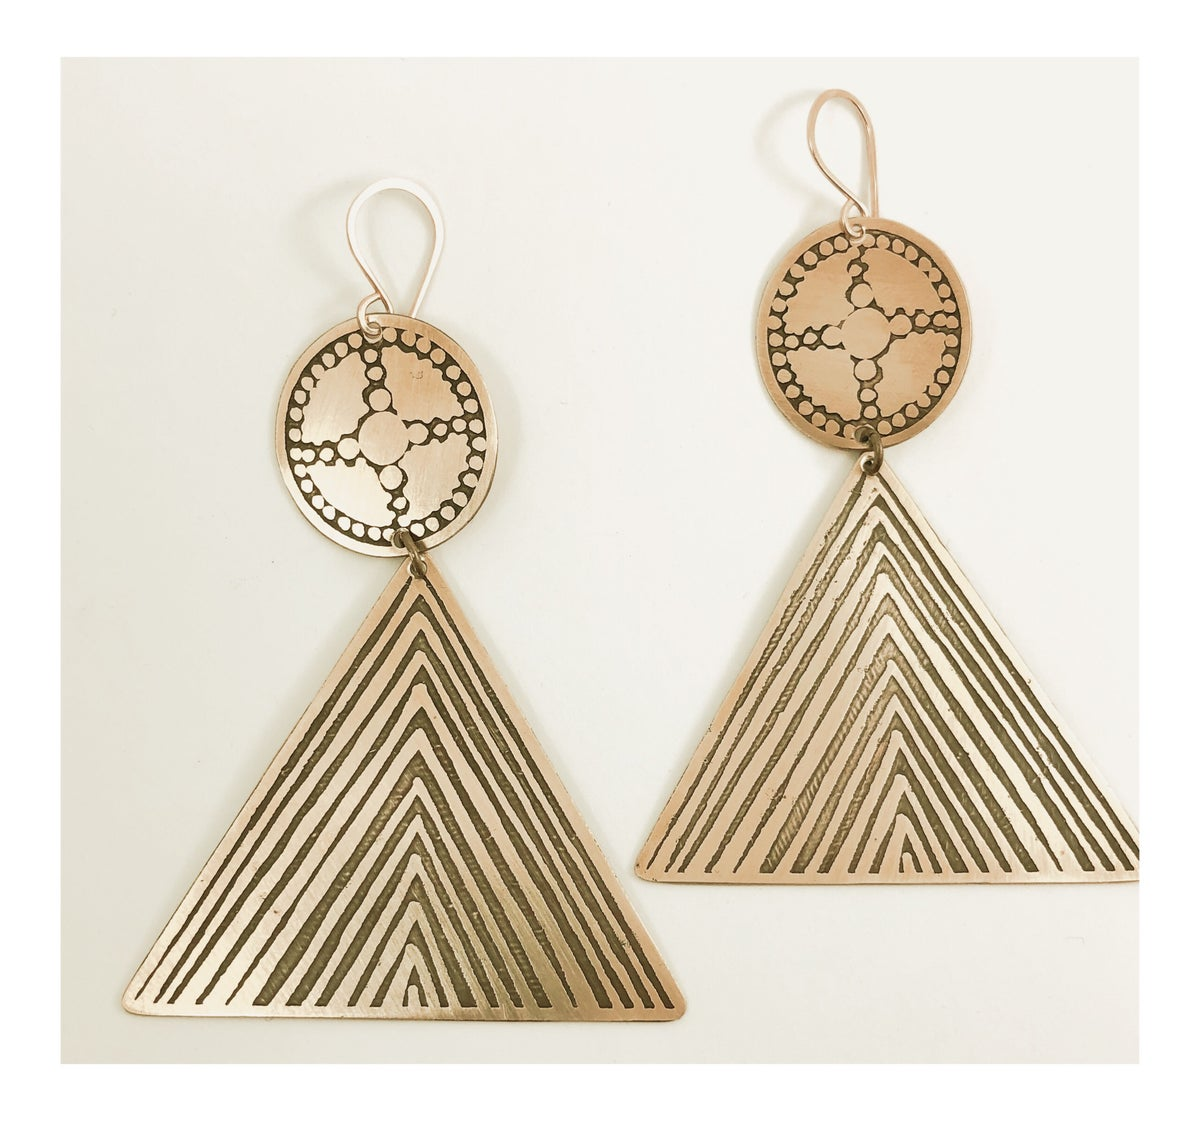 Image of Temple Earrings